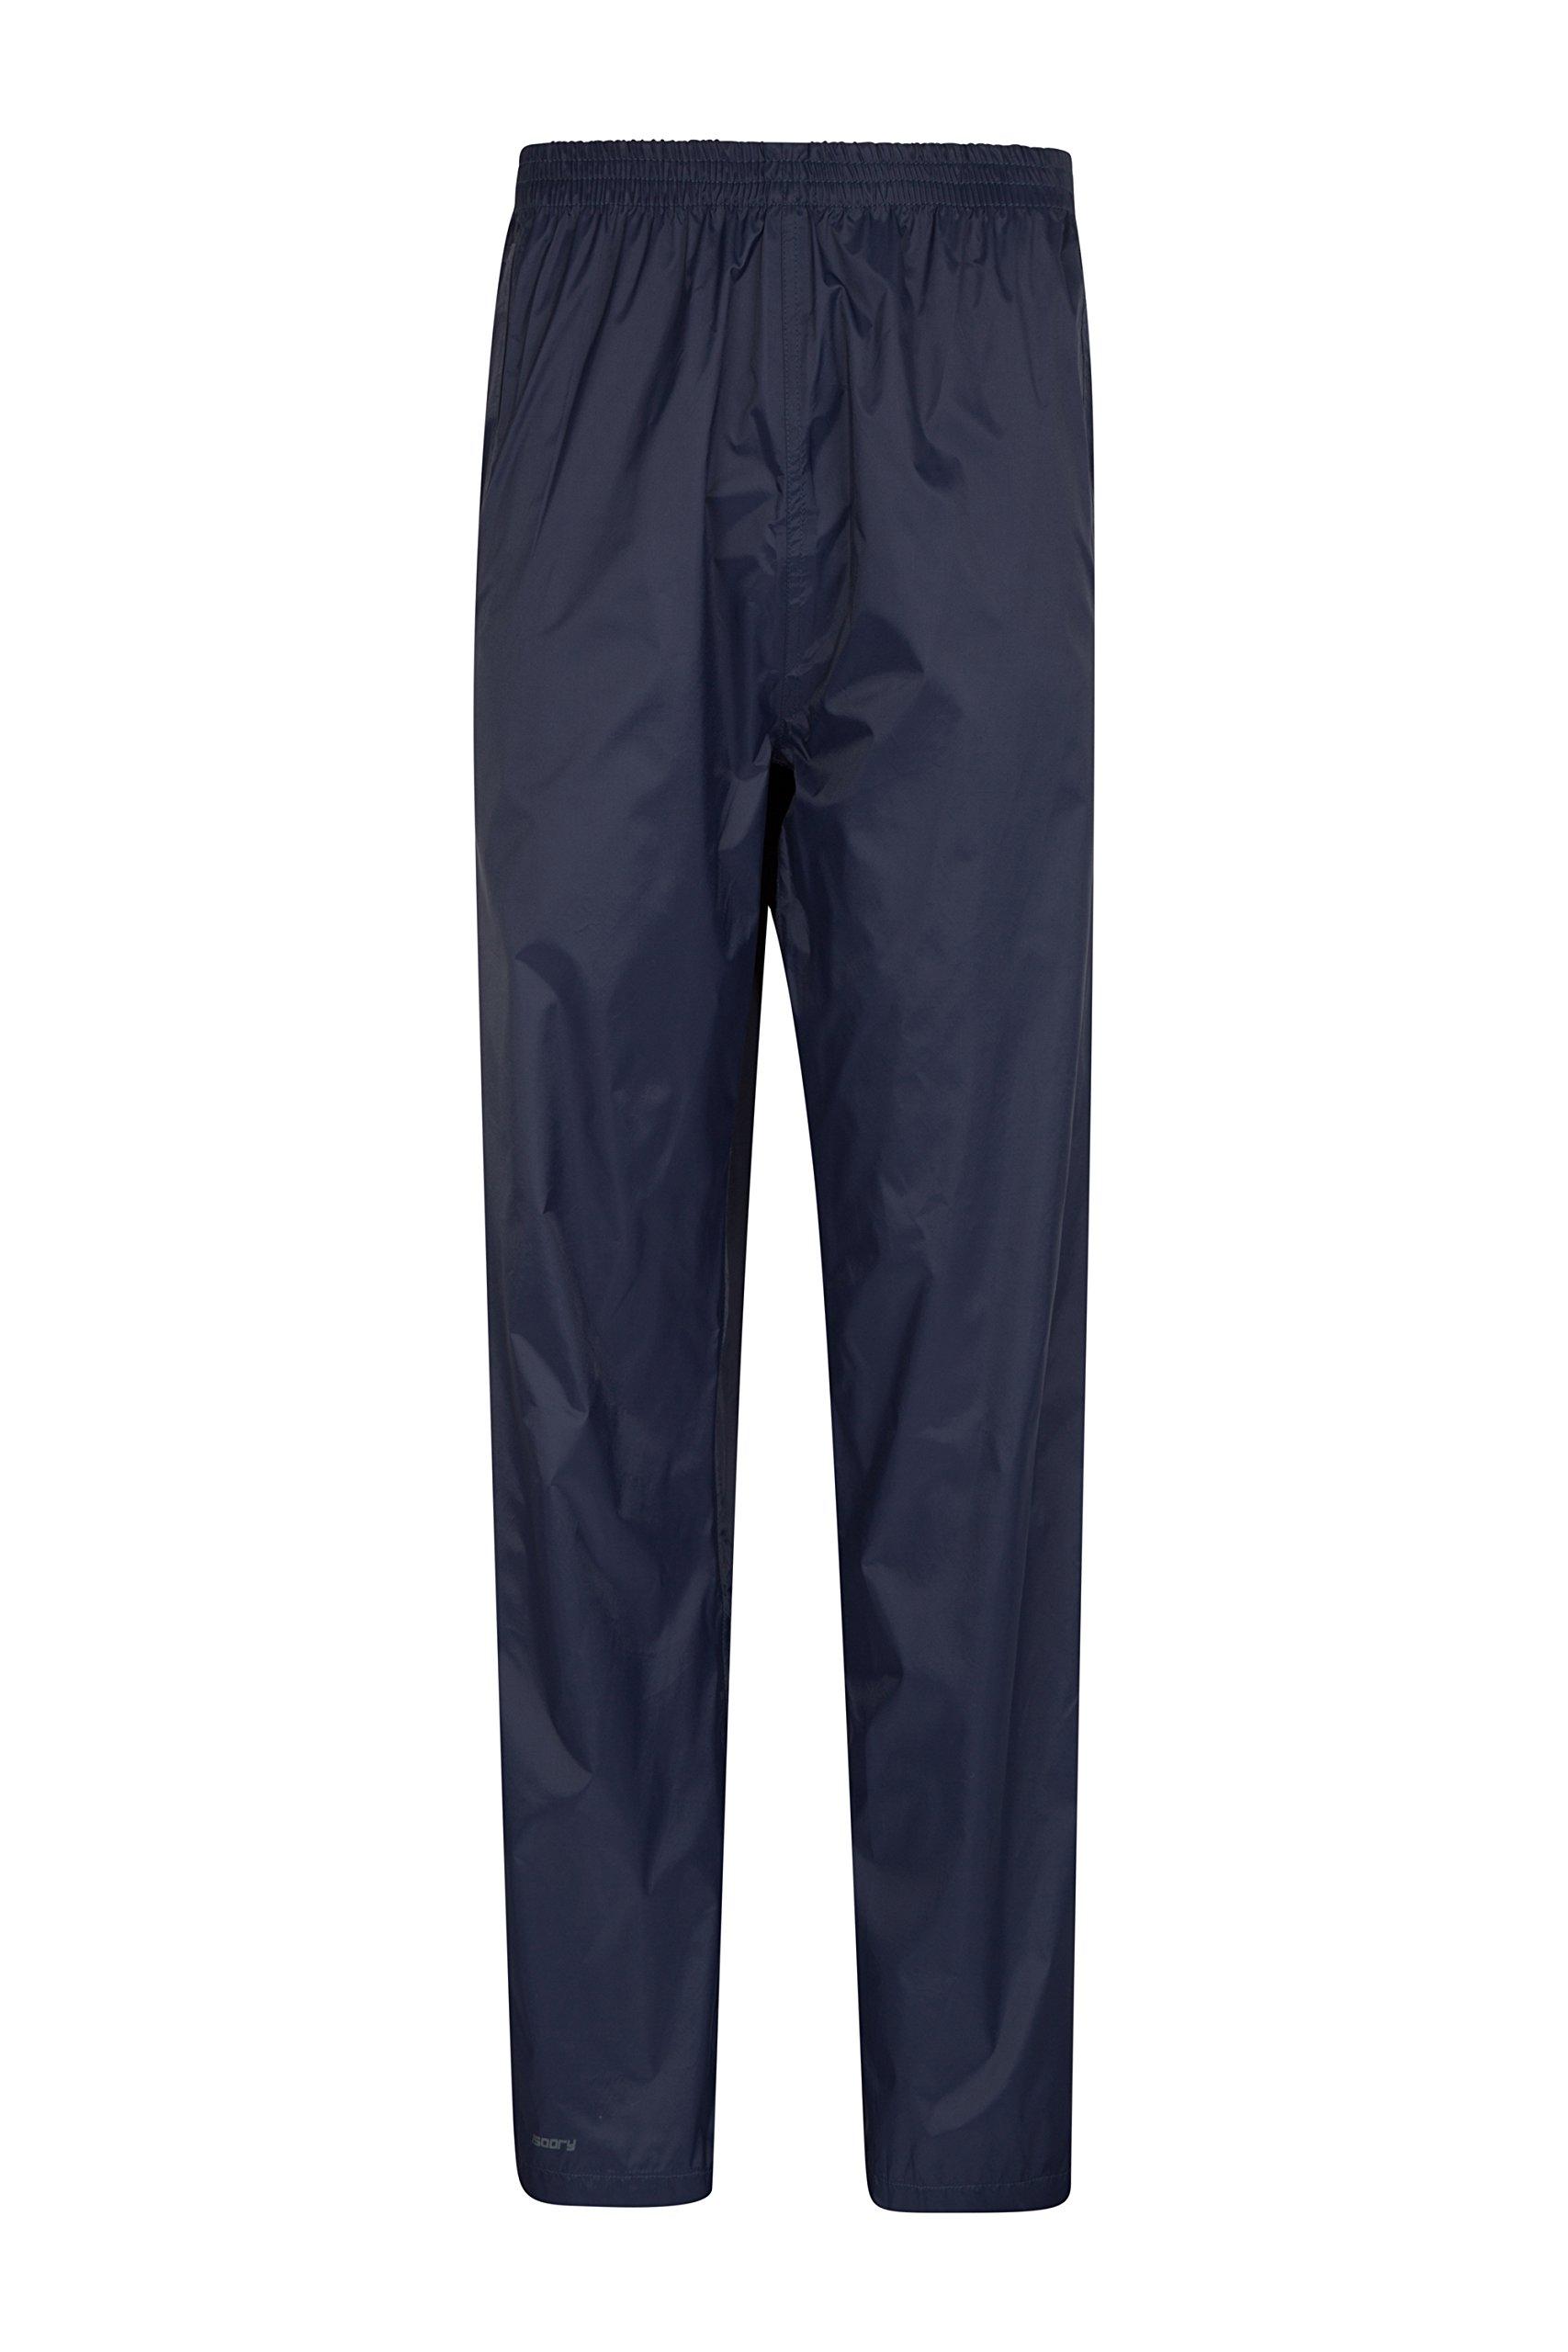 Mountain Warehouse Pakka Womens Rain Pants -Waterproof Ladies Pants Navy 2